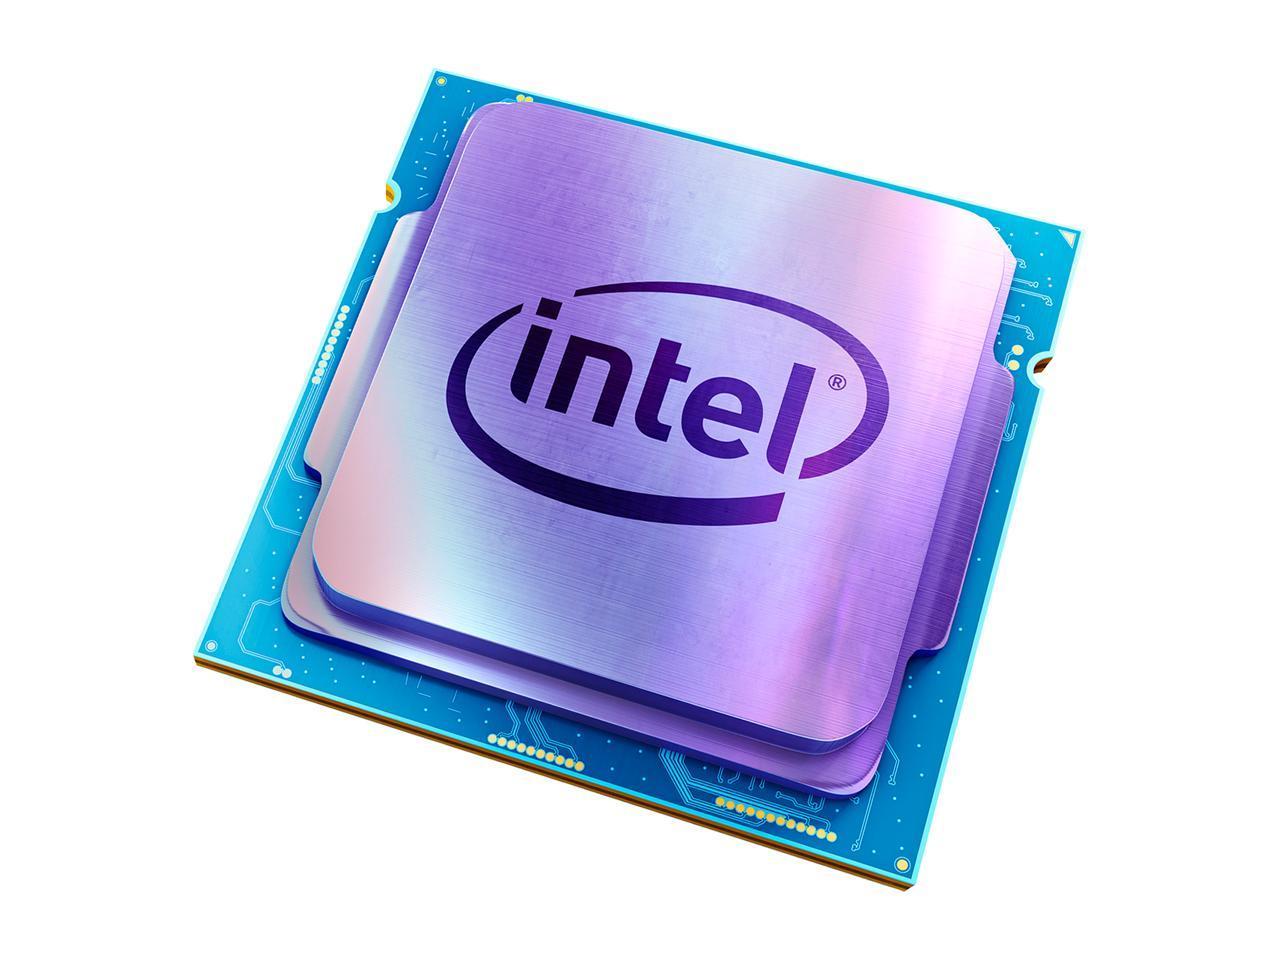 Intel Core i5-10400 Comet Lake 6-Core 2.9 GHz LGA 1200 65W BX8070110400 Desktop Processor Intel UHD Graphics 630 7